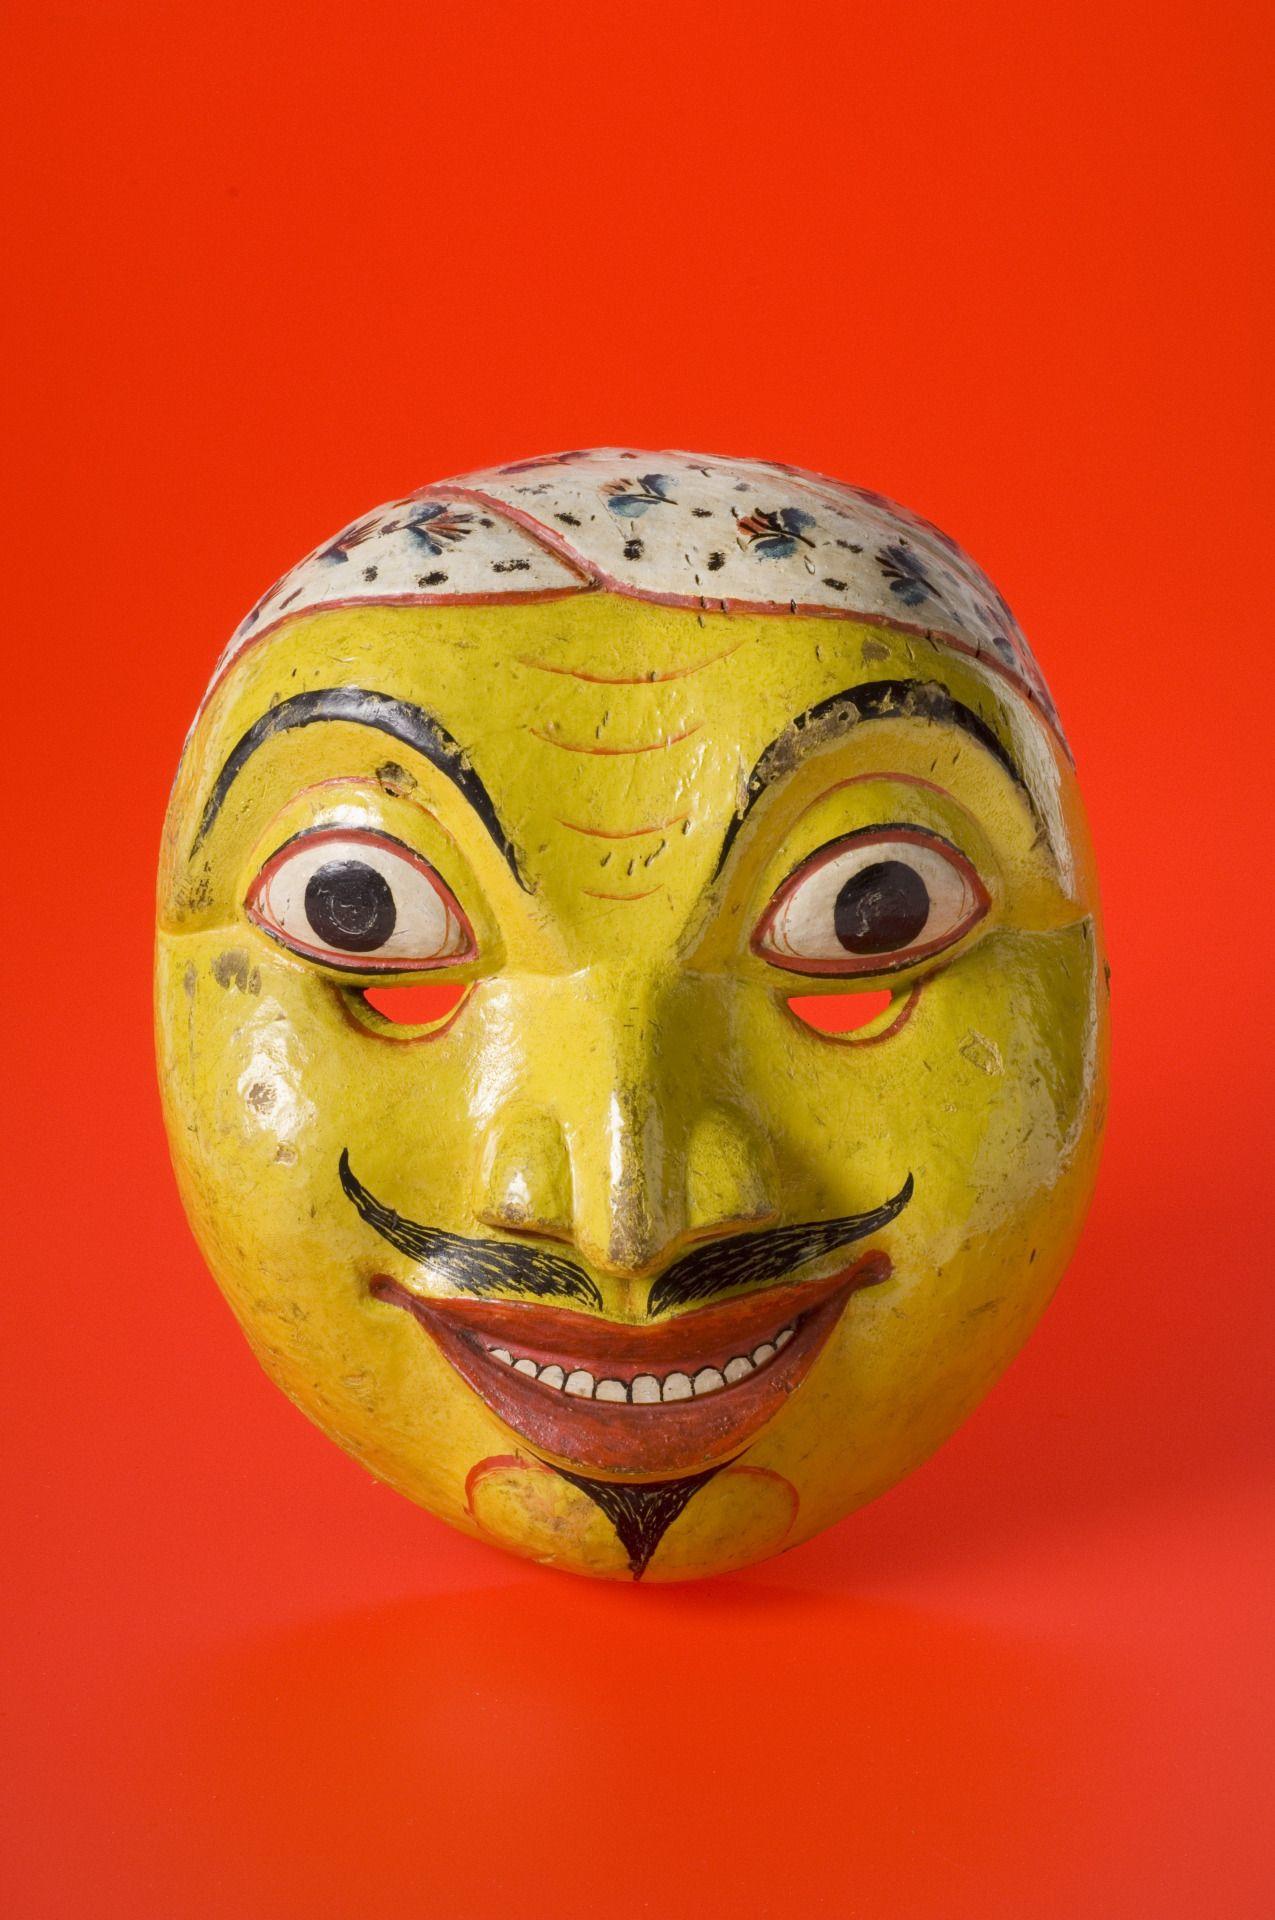 Kolam Mask / Sri Lanka, 1771 Masks art, Mask, Carnival